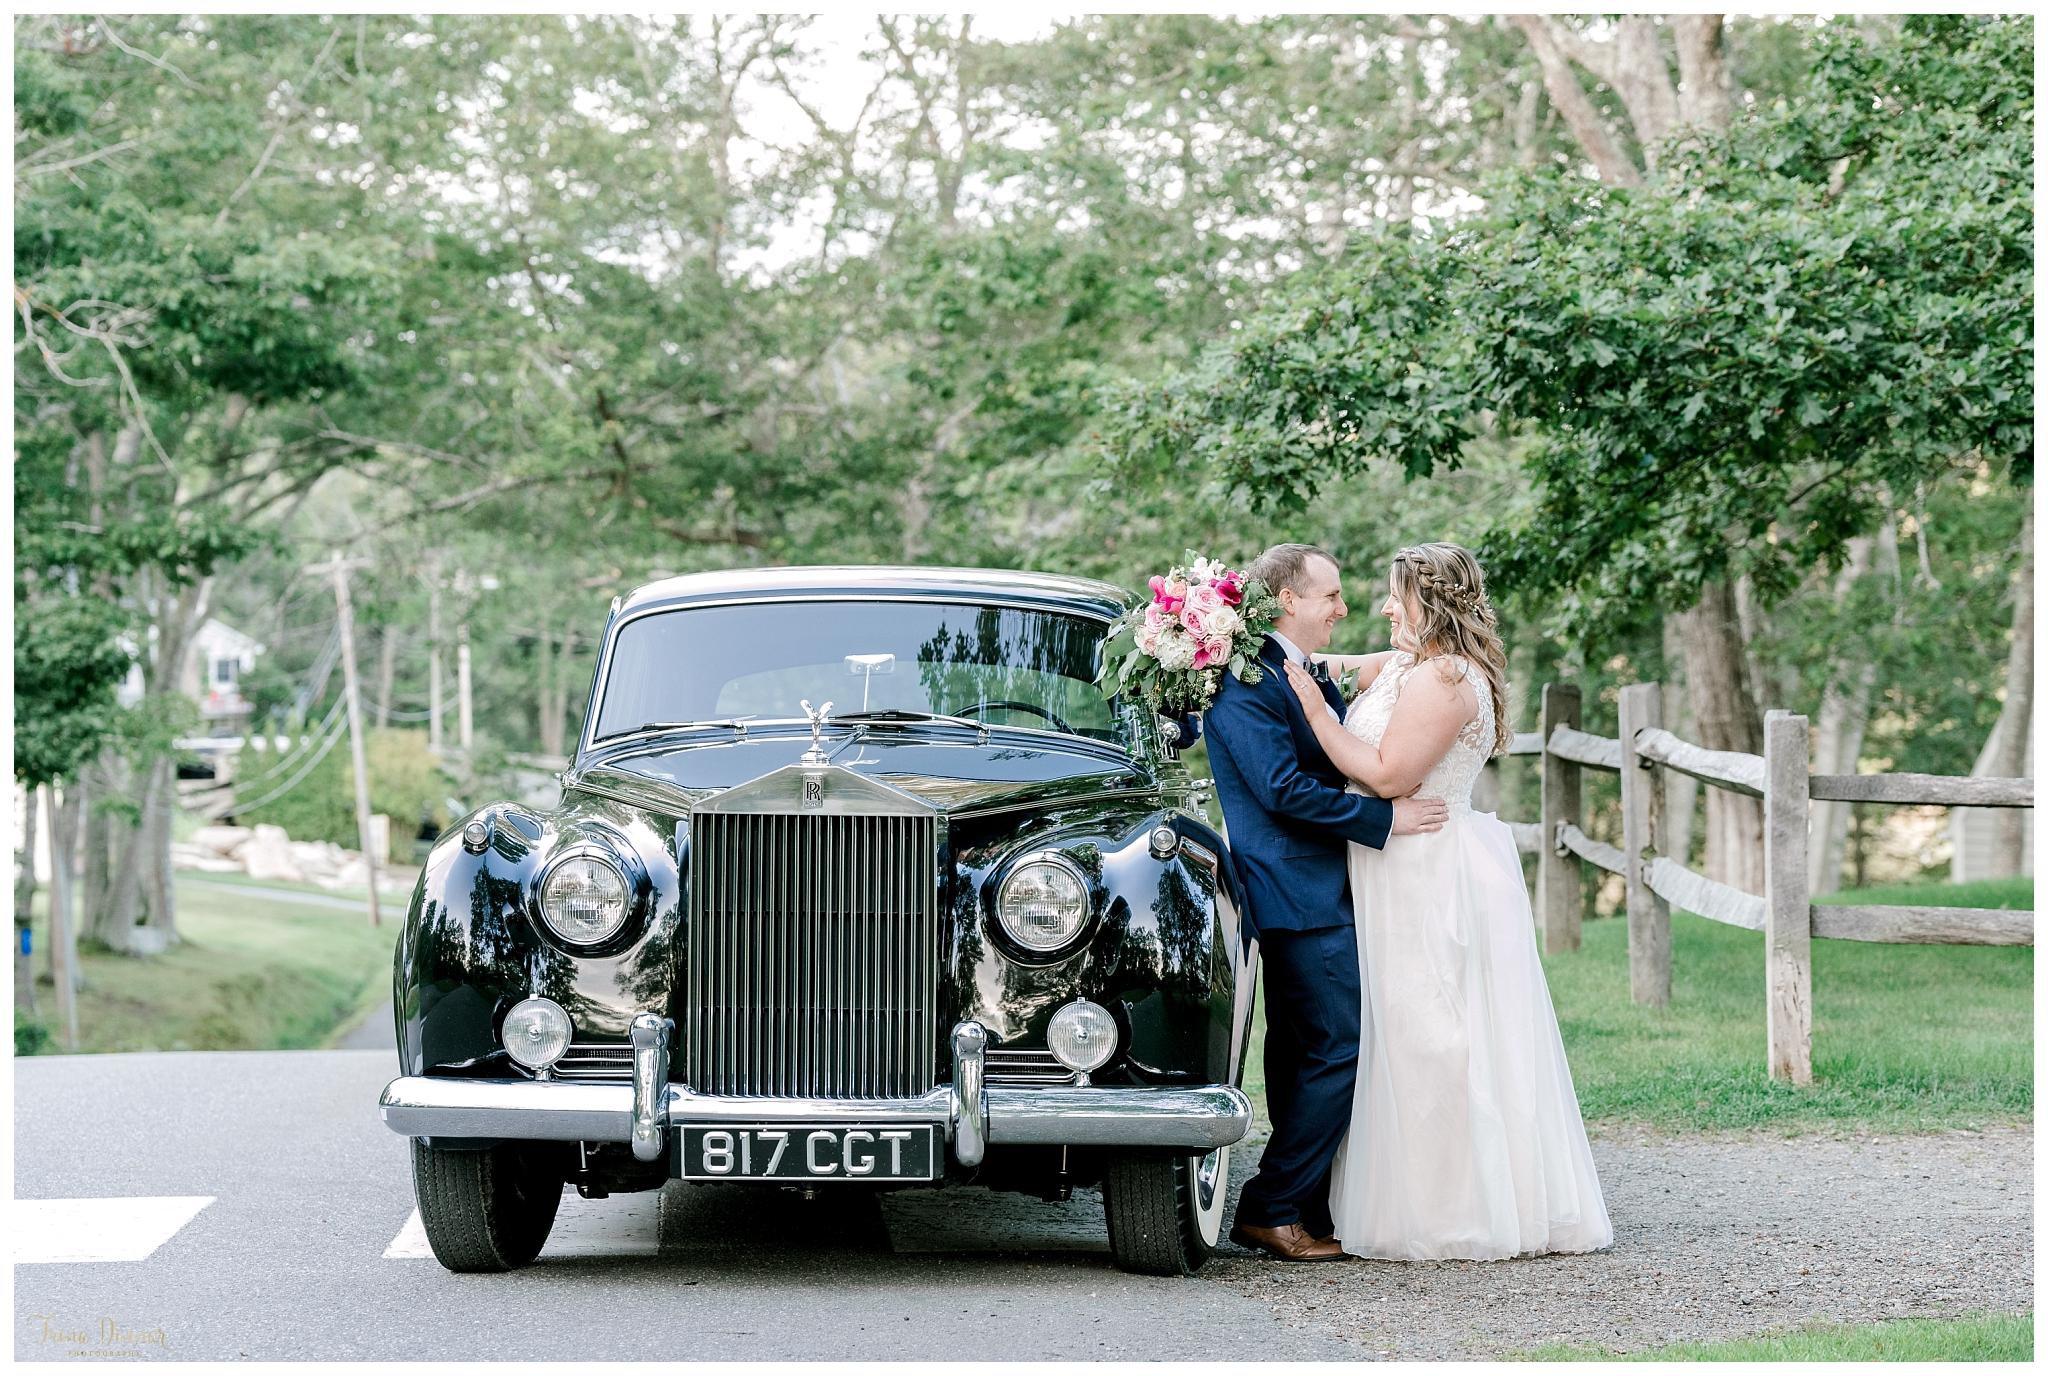 Antique Car Wedding Photo at Boothbay Railway Village